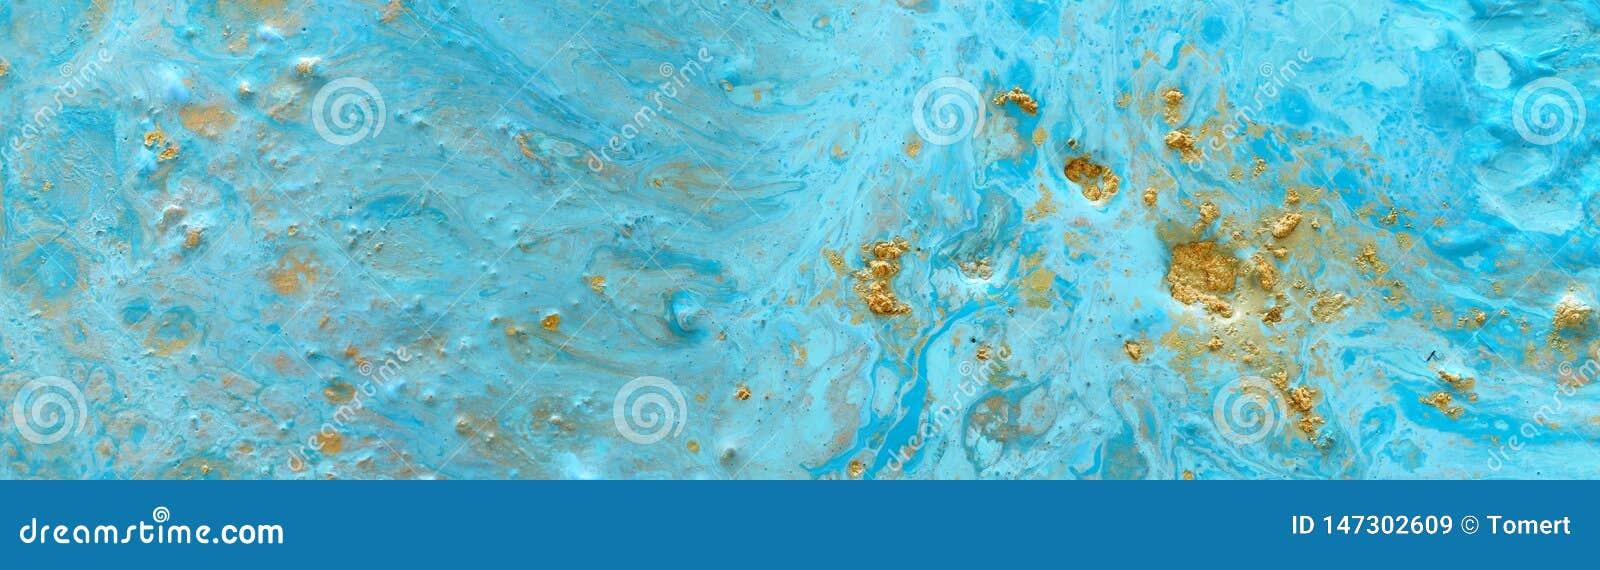 Fundo marbleized abstrato do efeito Cores criativas azuis Pintura bonita com a adi??o de ouro bandeira